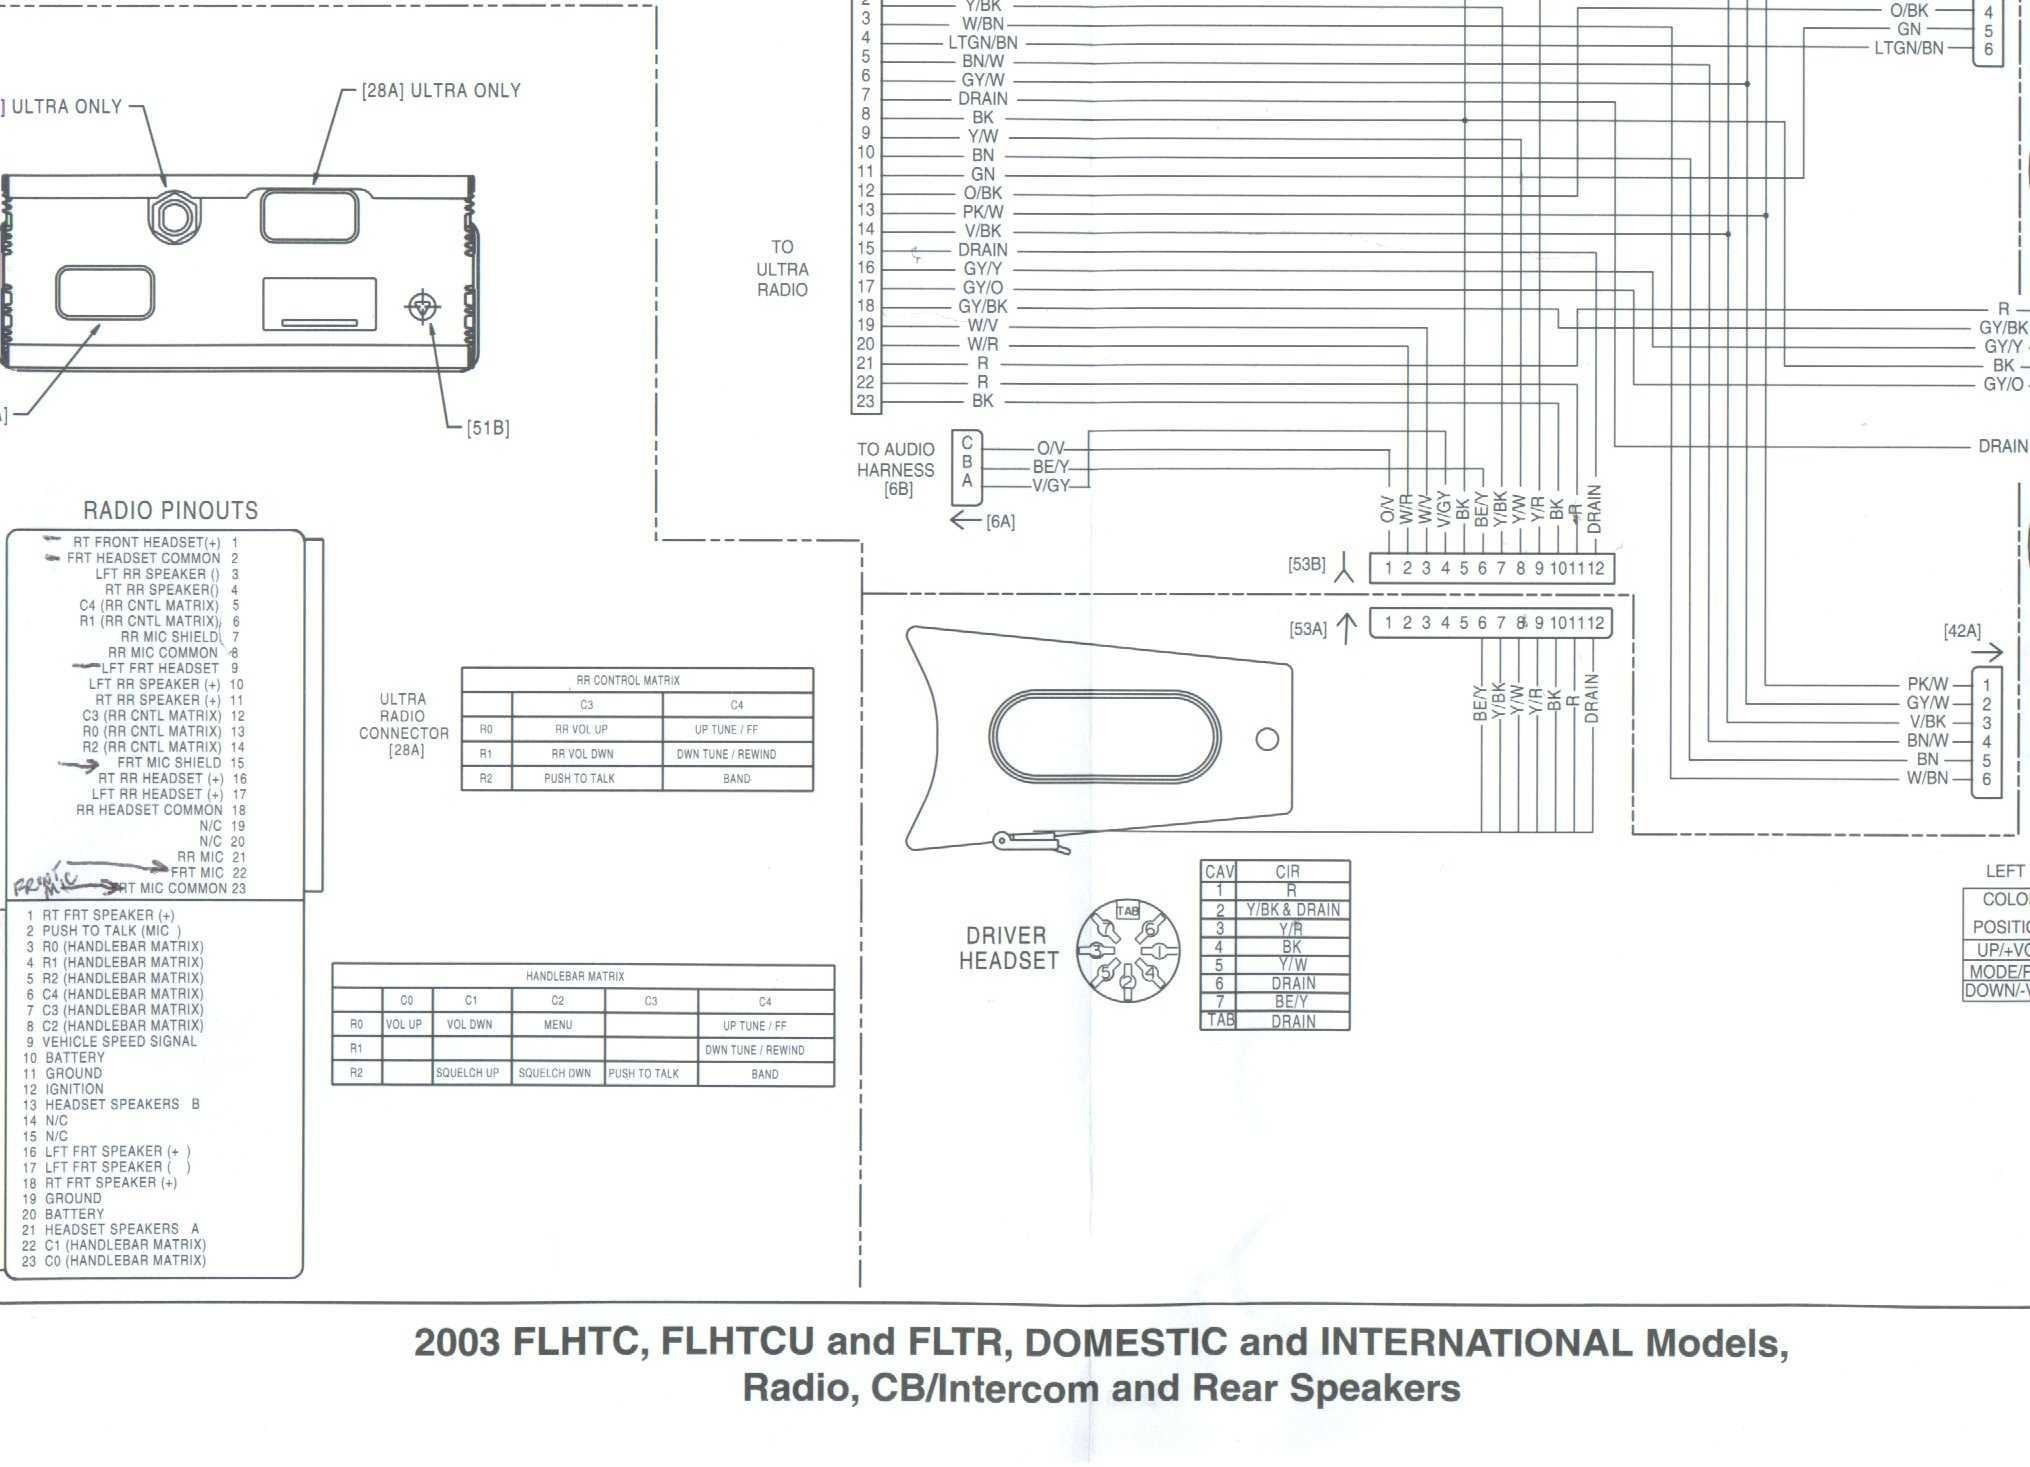 Sound system wiring diagram mack r model wiring diagram new mack ch mack r model wiring diagram new mack ch wiring diagram inspirationa cheapraybanclubmaster Choice Image